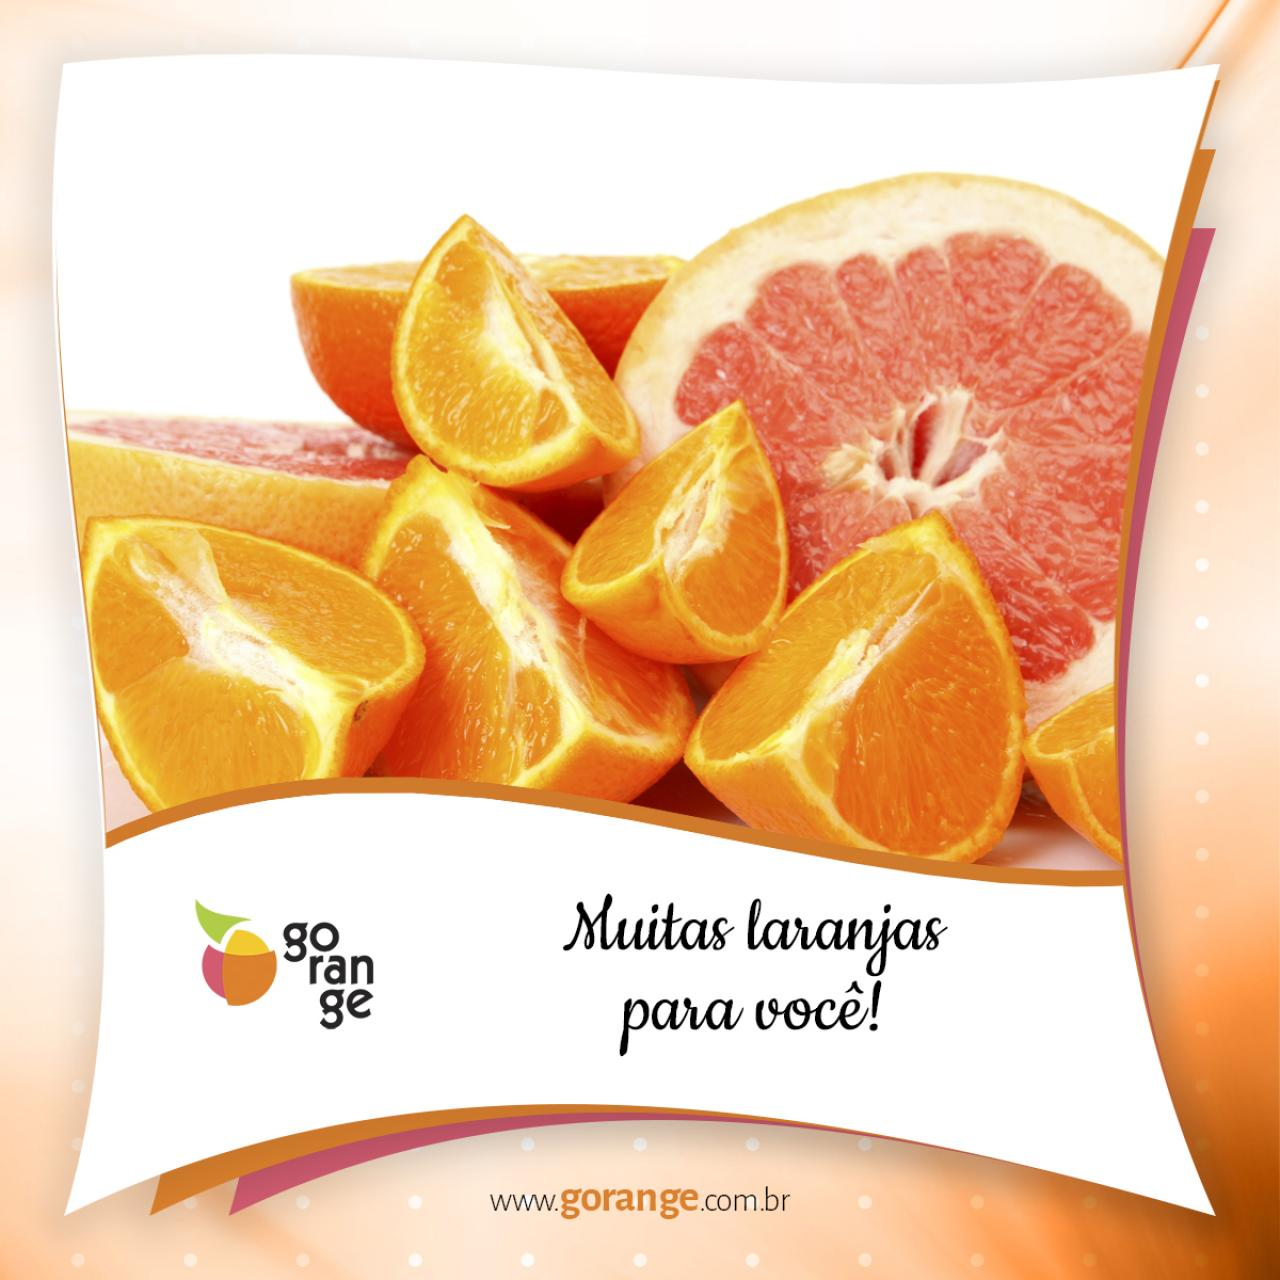 Muitas laranjas para você